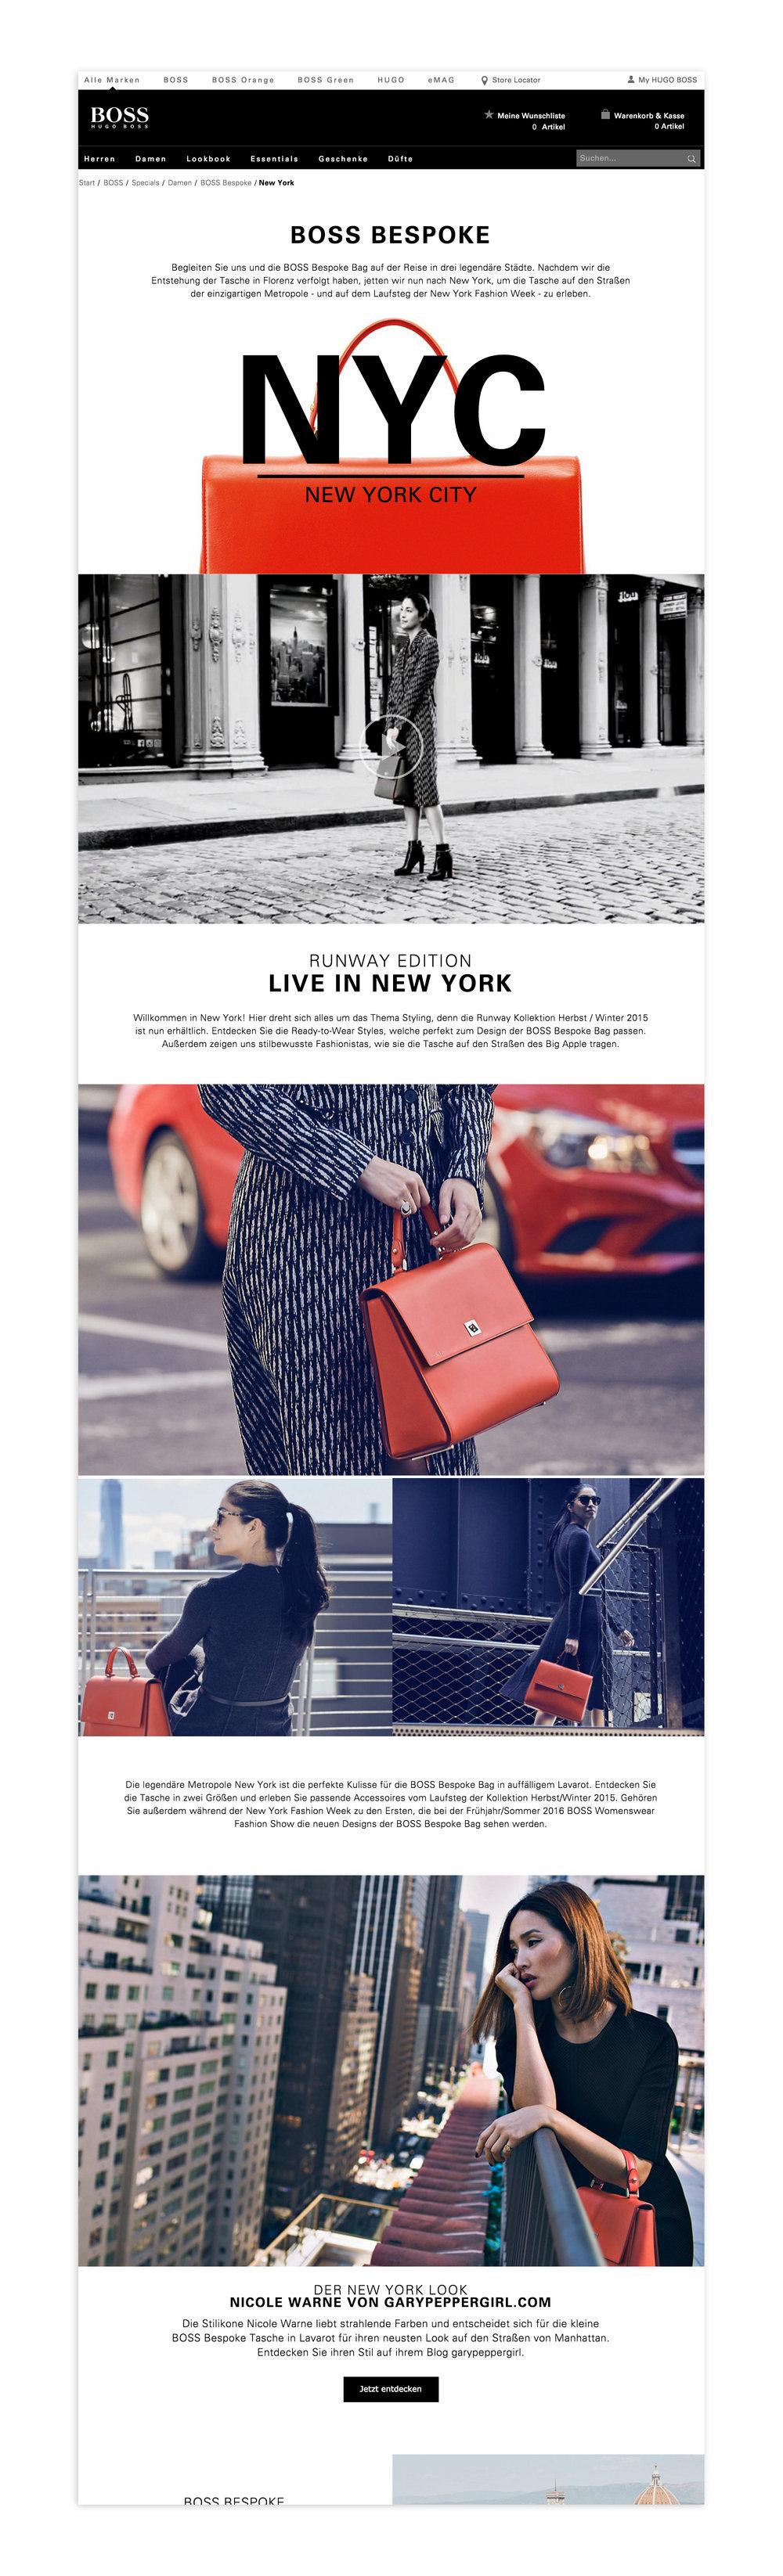 WERBEWELT-HUGO-BOSS-eCommerce-Brand-Online-Shop-Platform-2